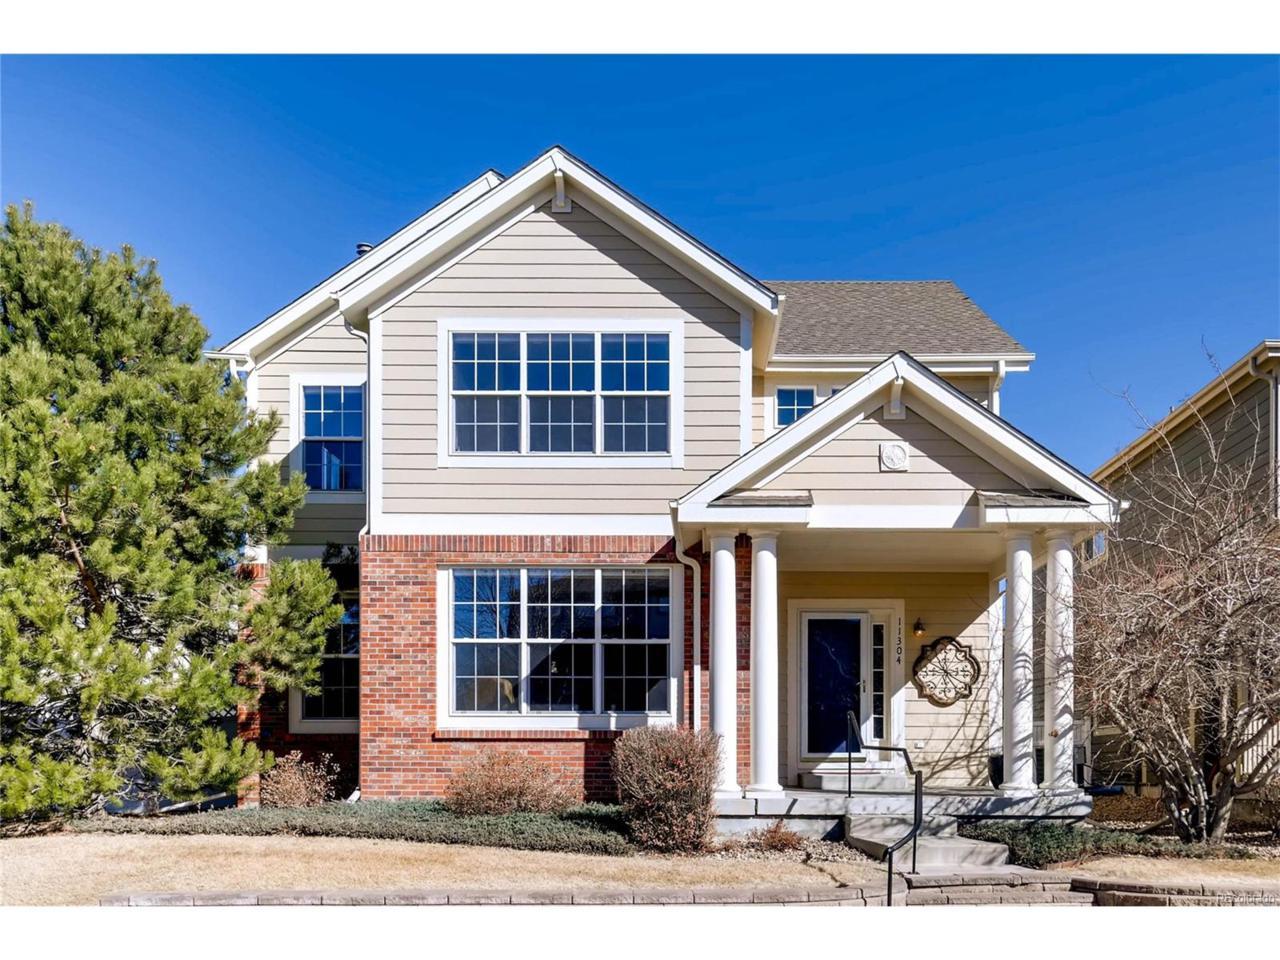 11304 S Fire Rock Drive, Parker, CO 80134 (MLS #7170604) :: 8z Real Estate